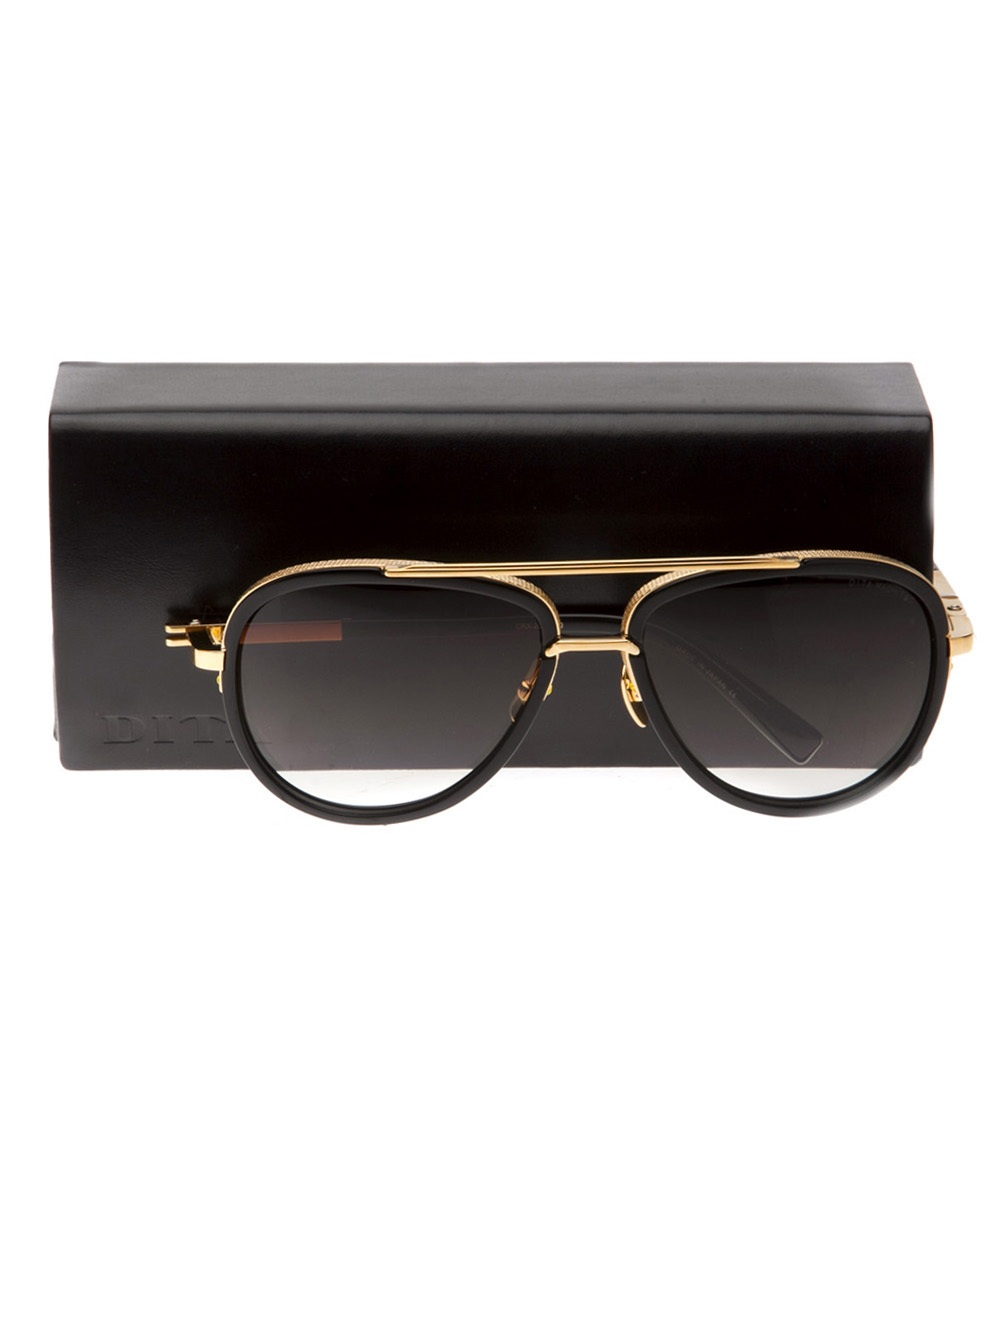 Dita Eyewear Mach Two Sunglasses in Gold (Metallic) for Men